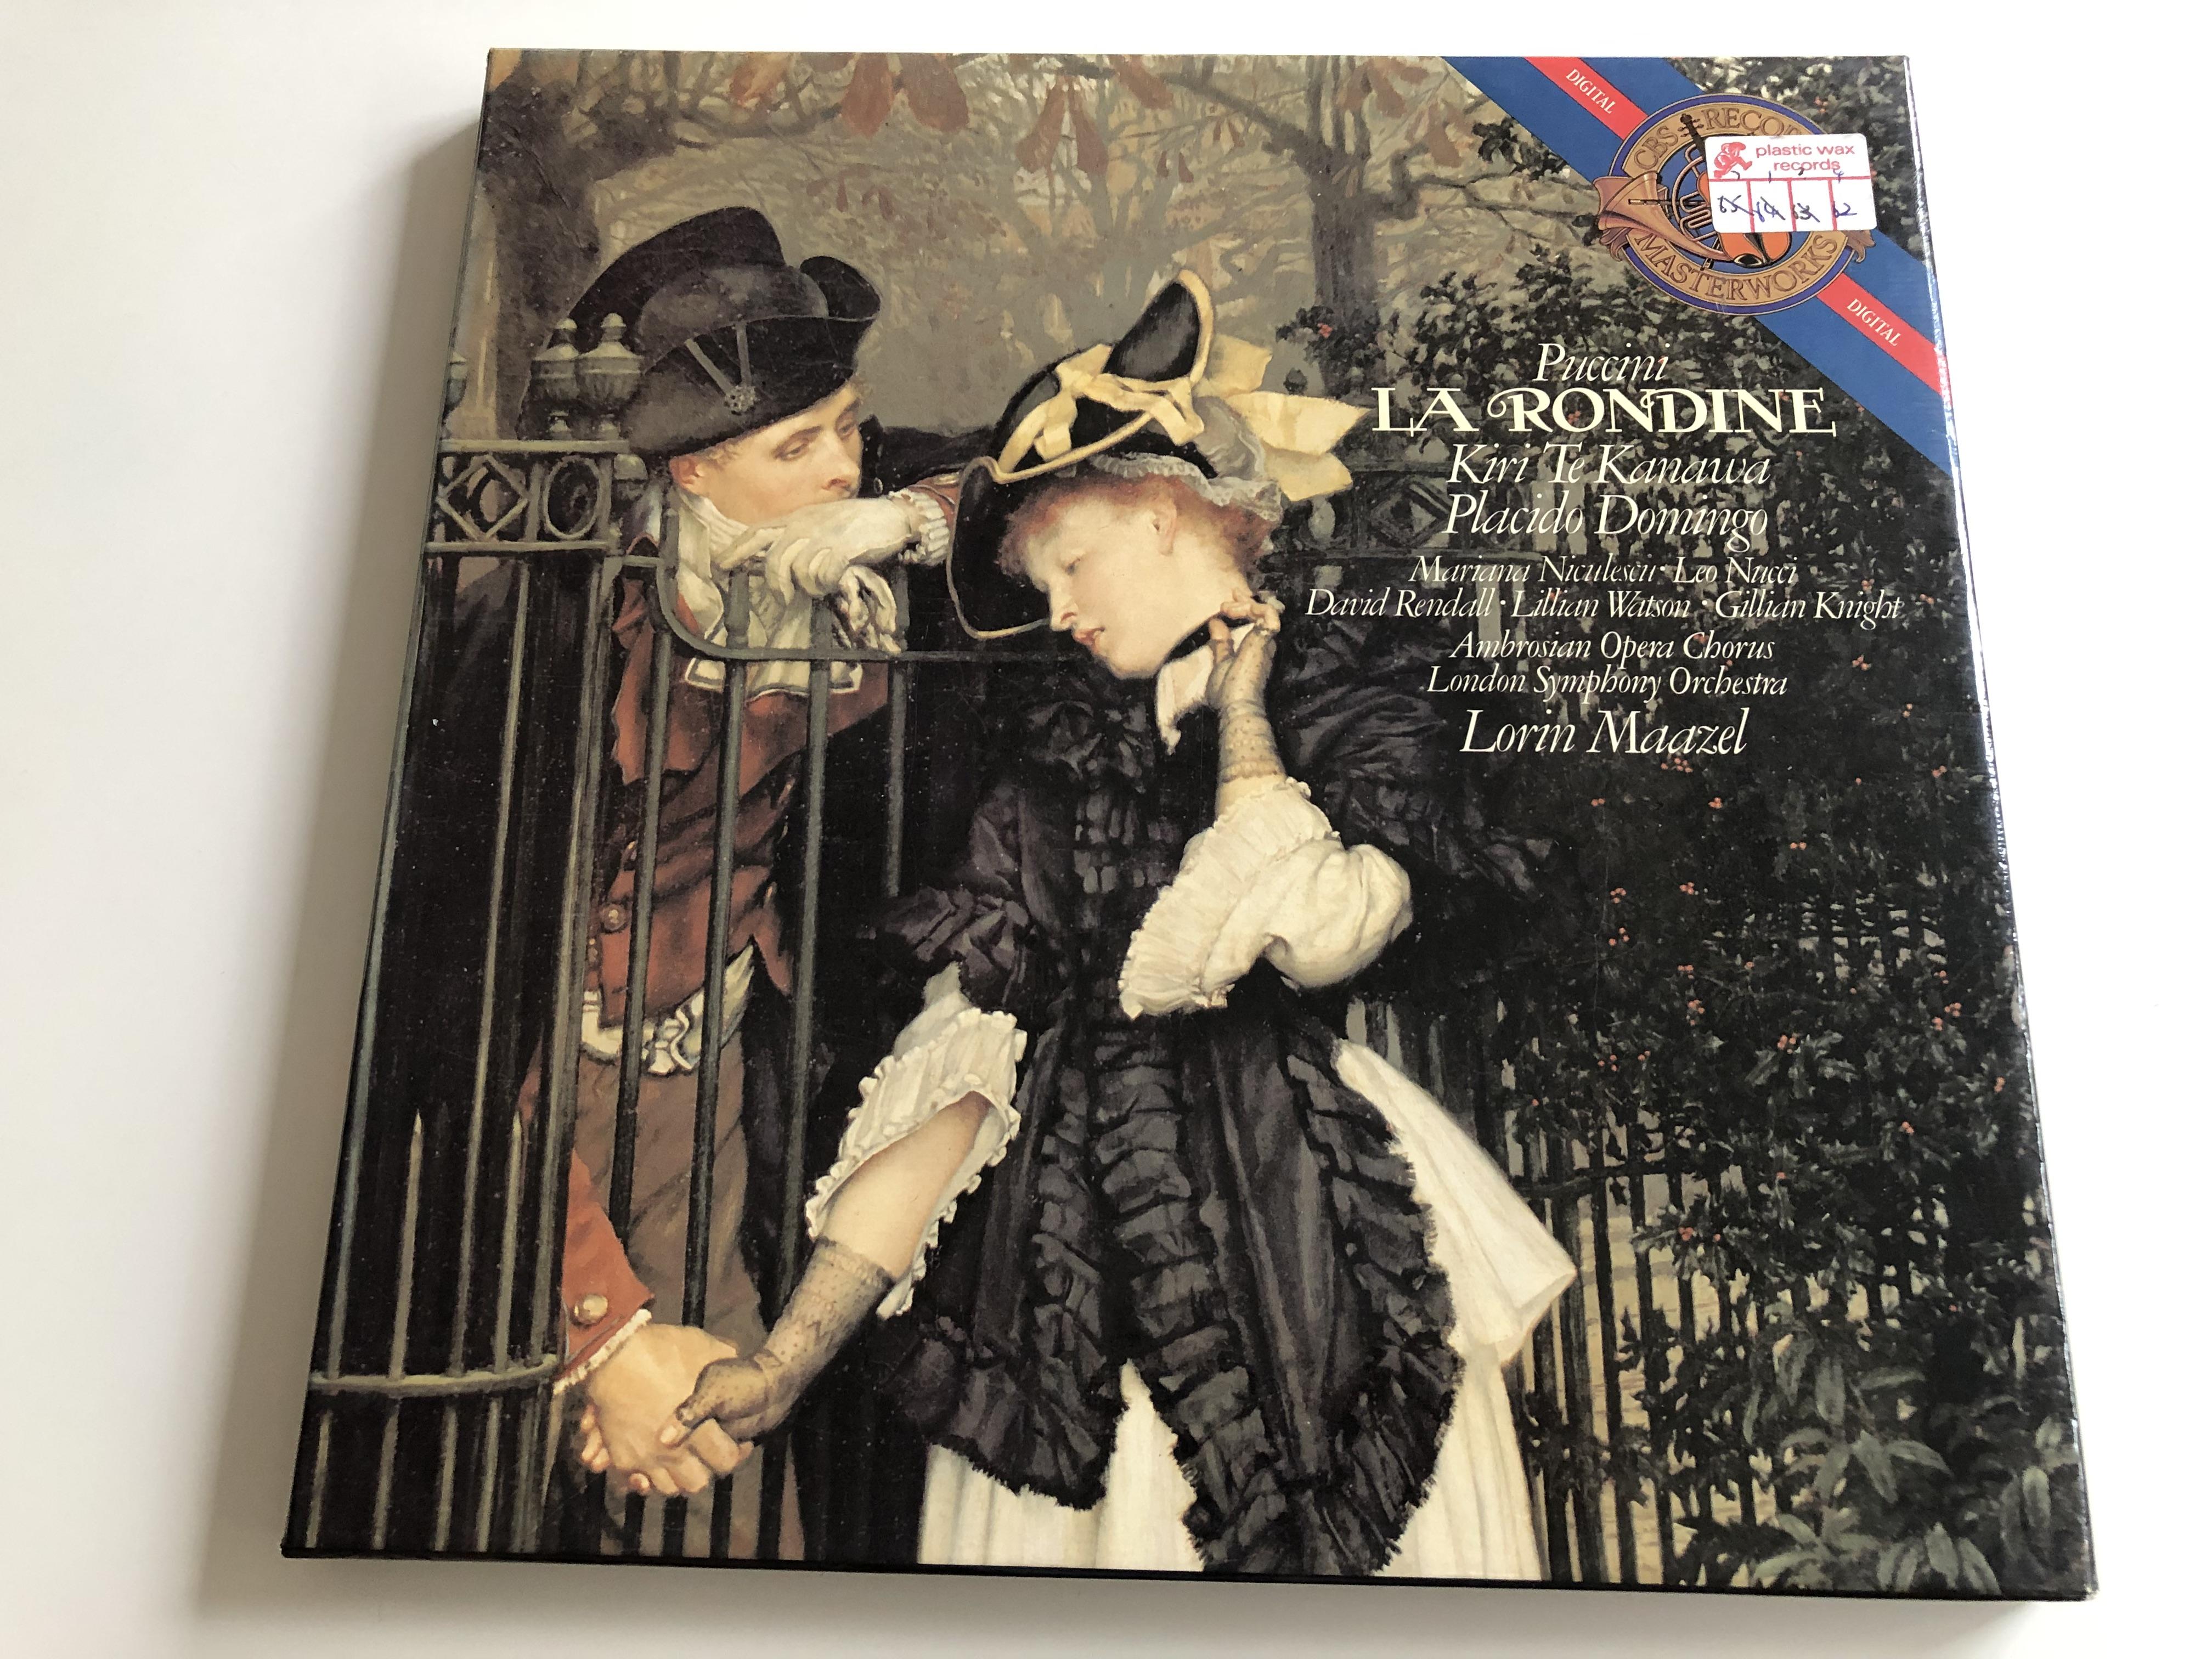 puccini-la-rondine-kiri-te-kanawa-placido-domingo-lorin-maazel-ambrosian-opera-chorus-london-symphony-orchestra-cbs-masterworks-2x-lp-digital-stereo-d2-37852-us-can-i2m-37852-1-.jpg